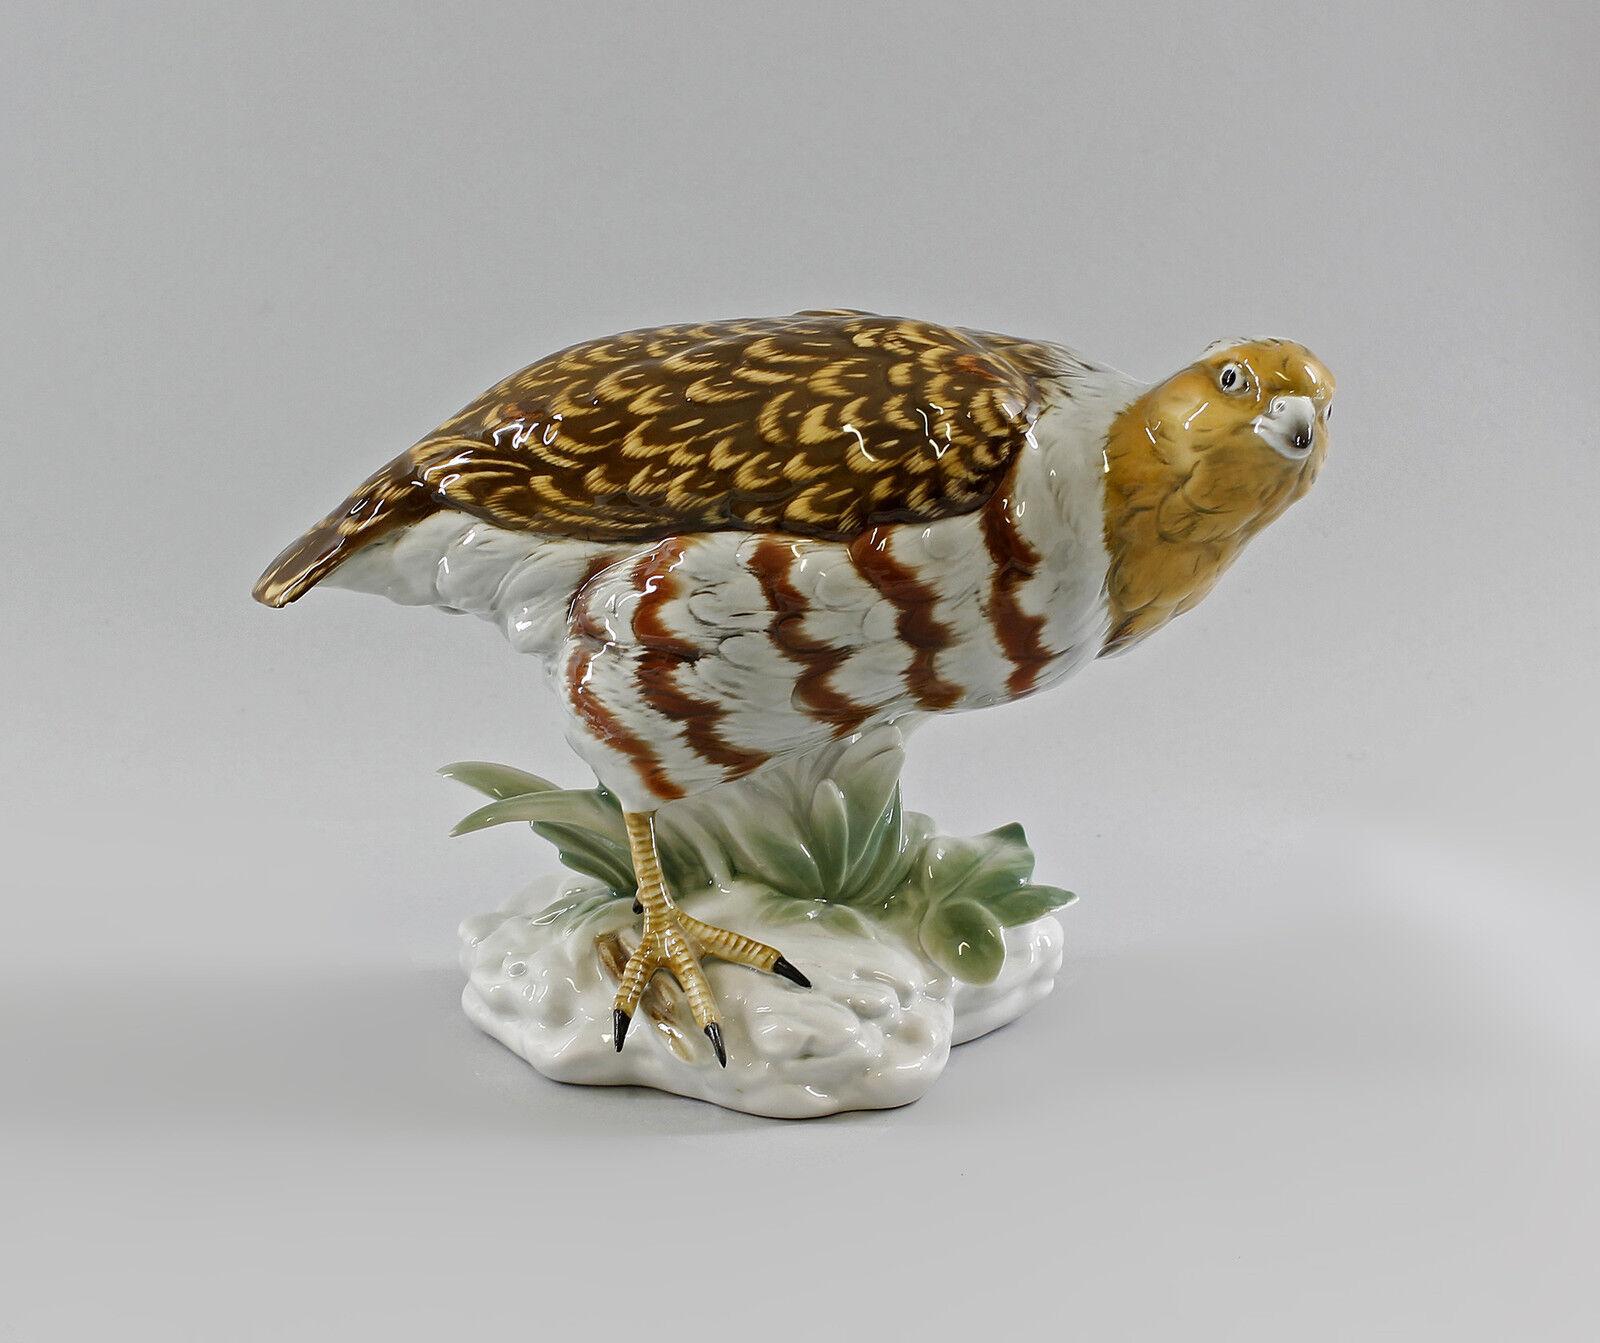 Porcelana figura pájaro reclamos faisán ens 26x18cm 9997831